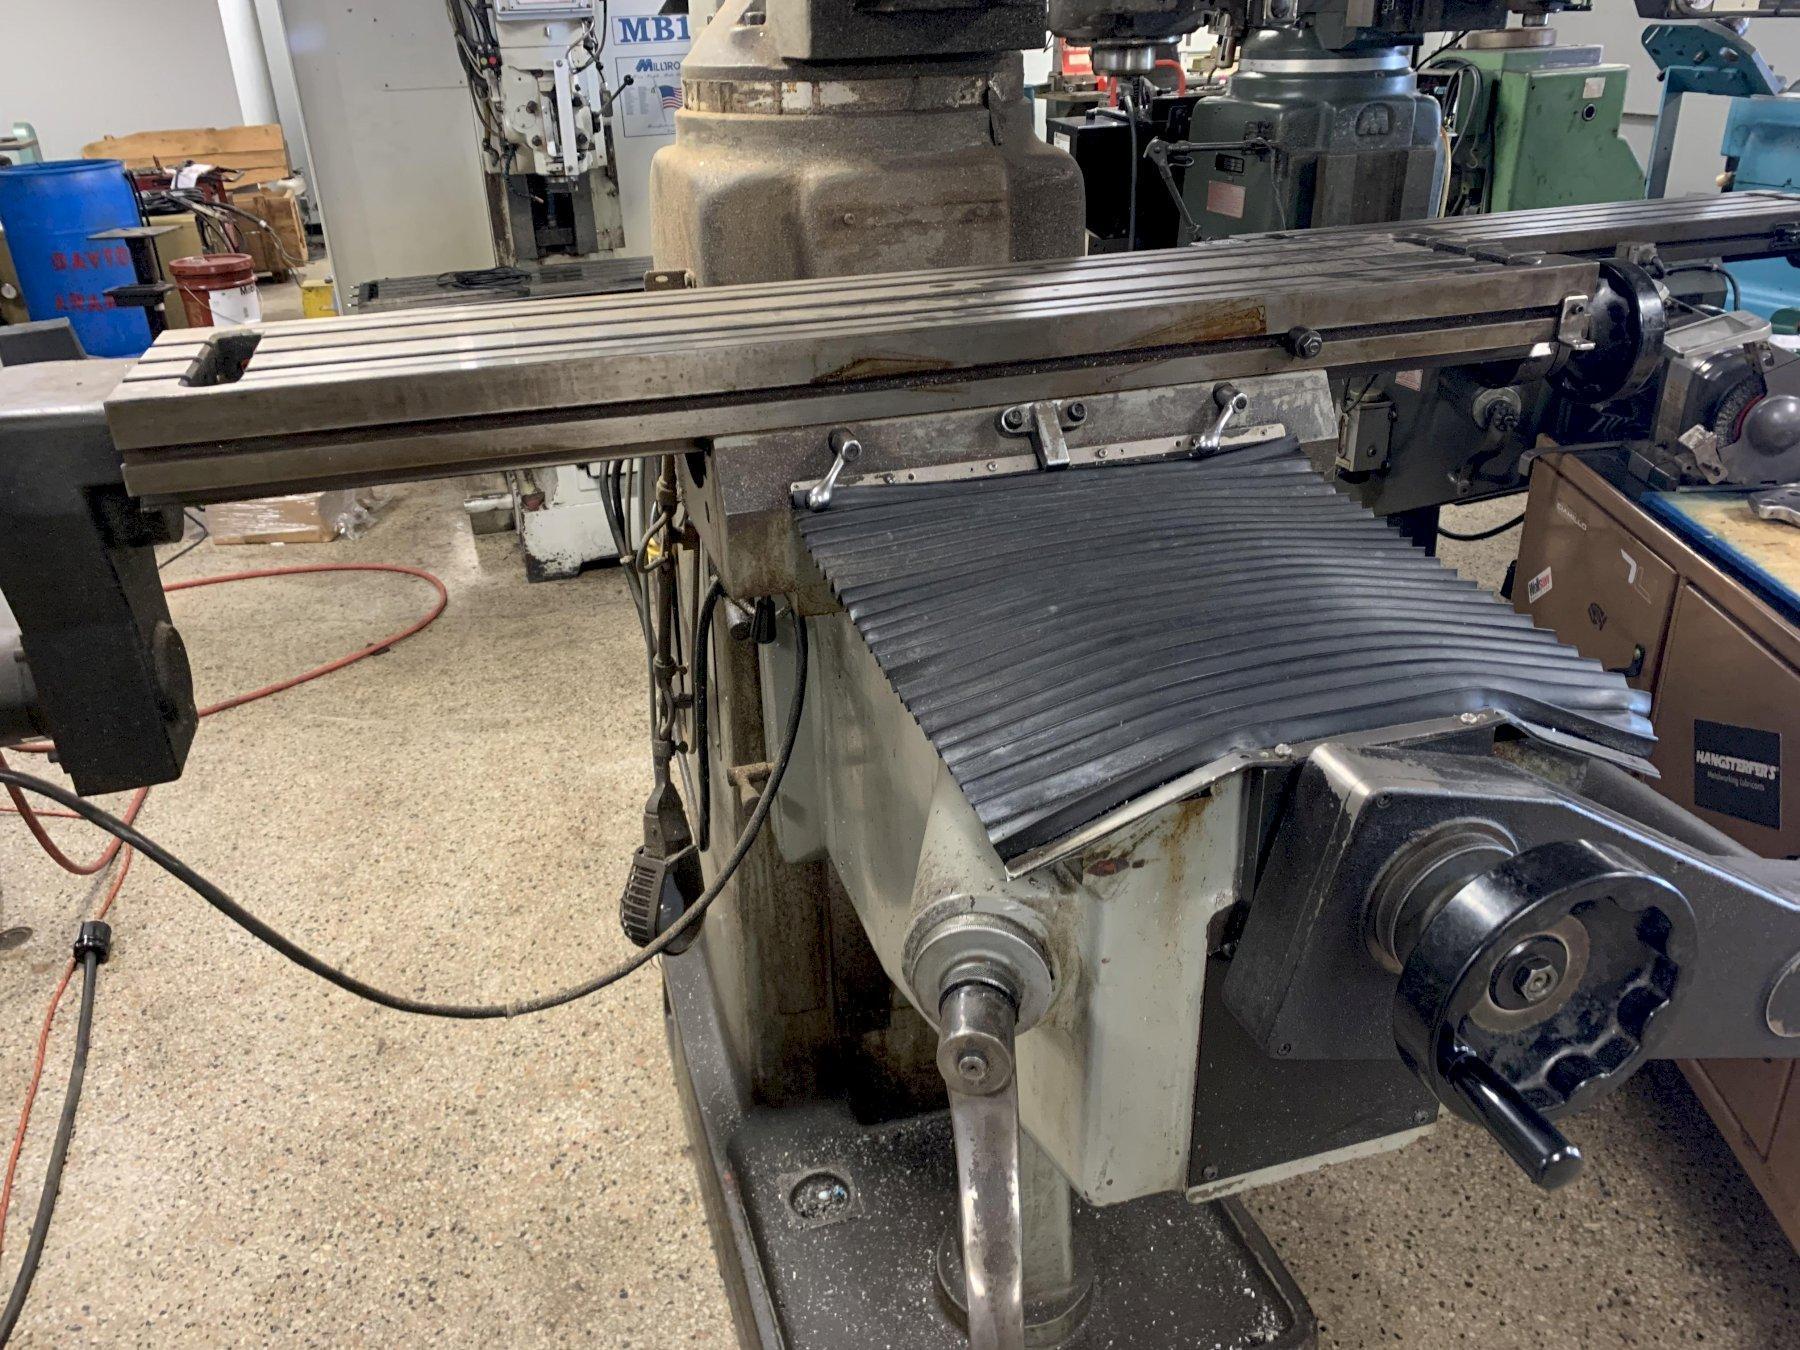 Sharp QMV-1 Milling Machine